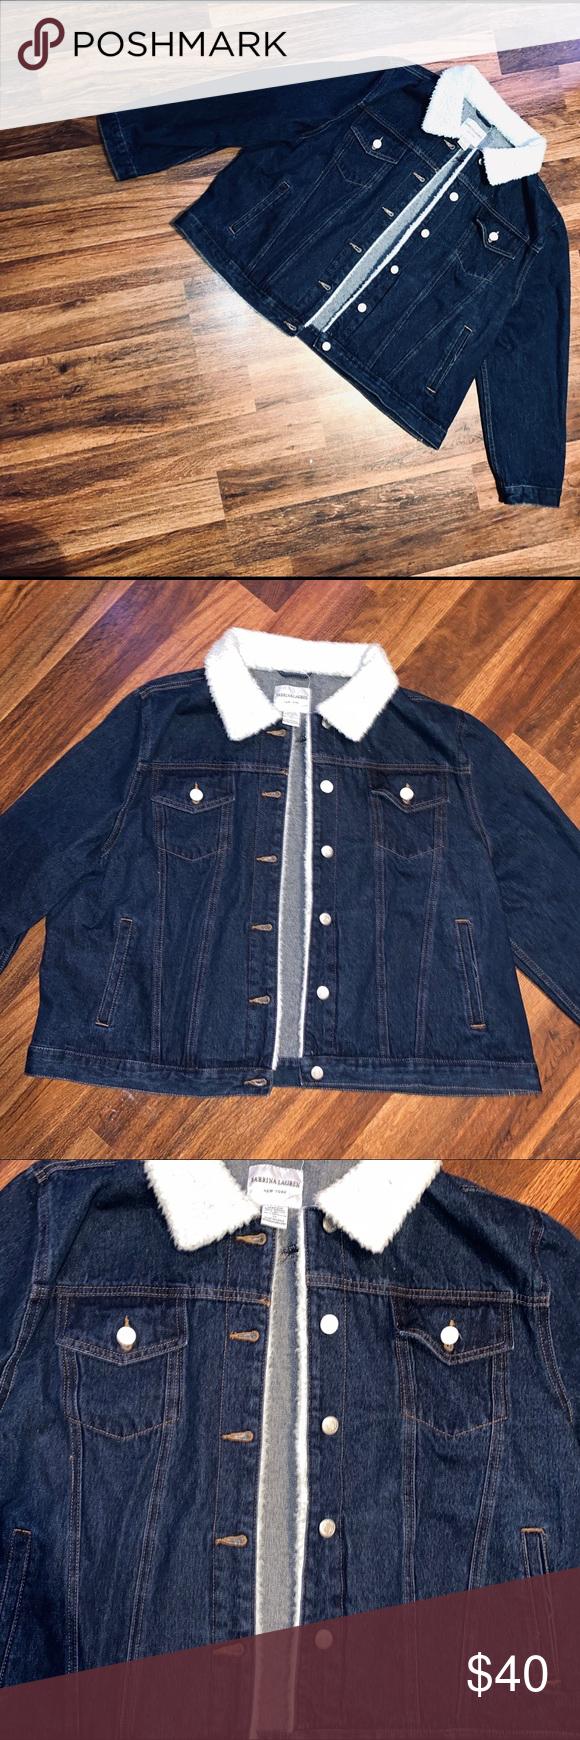 Sabrina Lauren Dark Blue Jean Jacket This Is In Great Shape It Has No Stains Holes Or Tears It Has One Or Blue Jean Jacket Dark Blue Jeans Jean Jacket [ 1740 x 580 Pixel ]